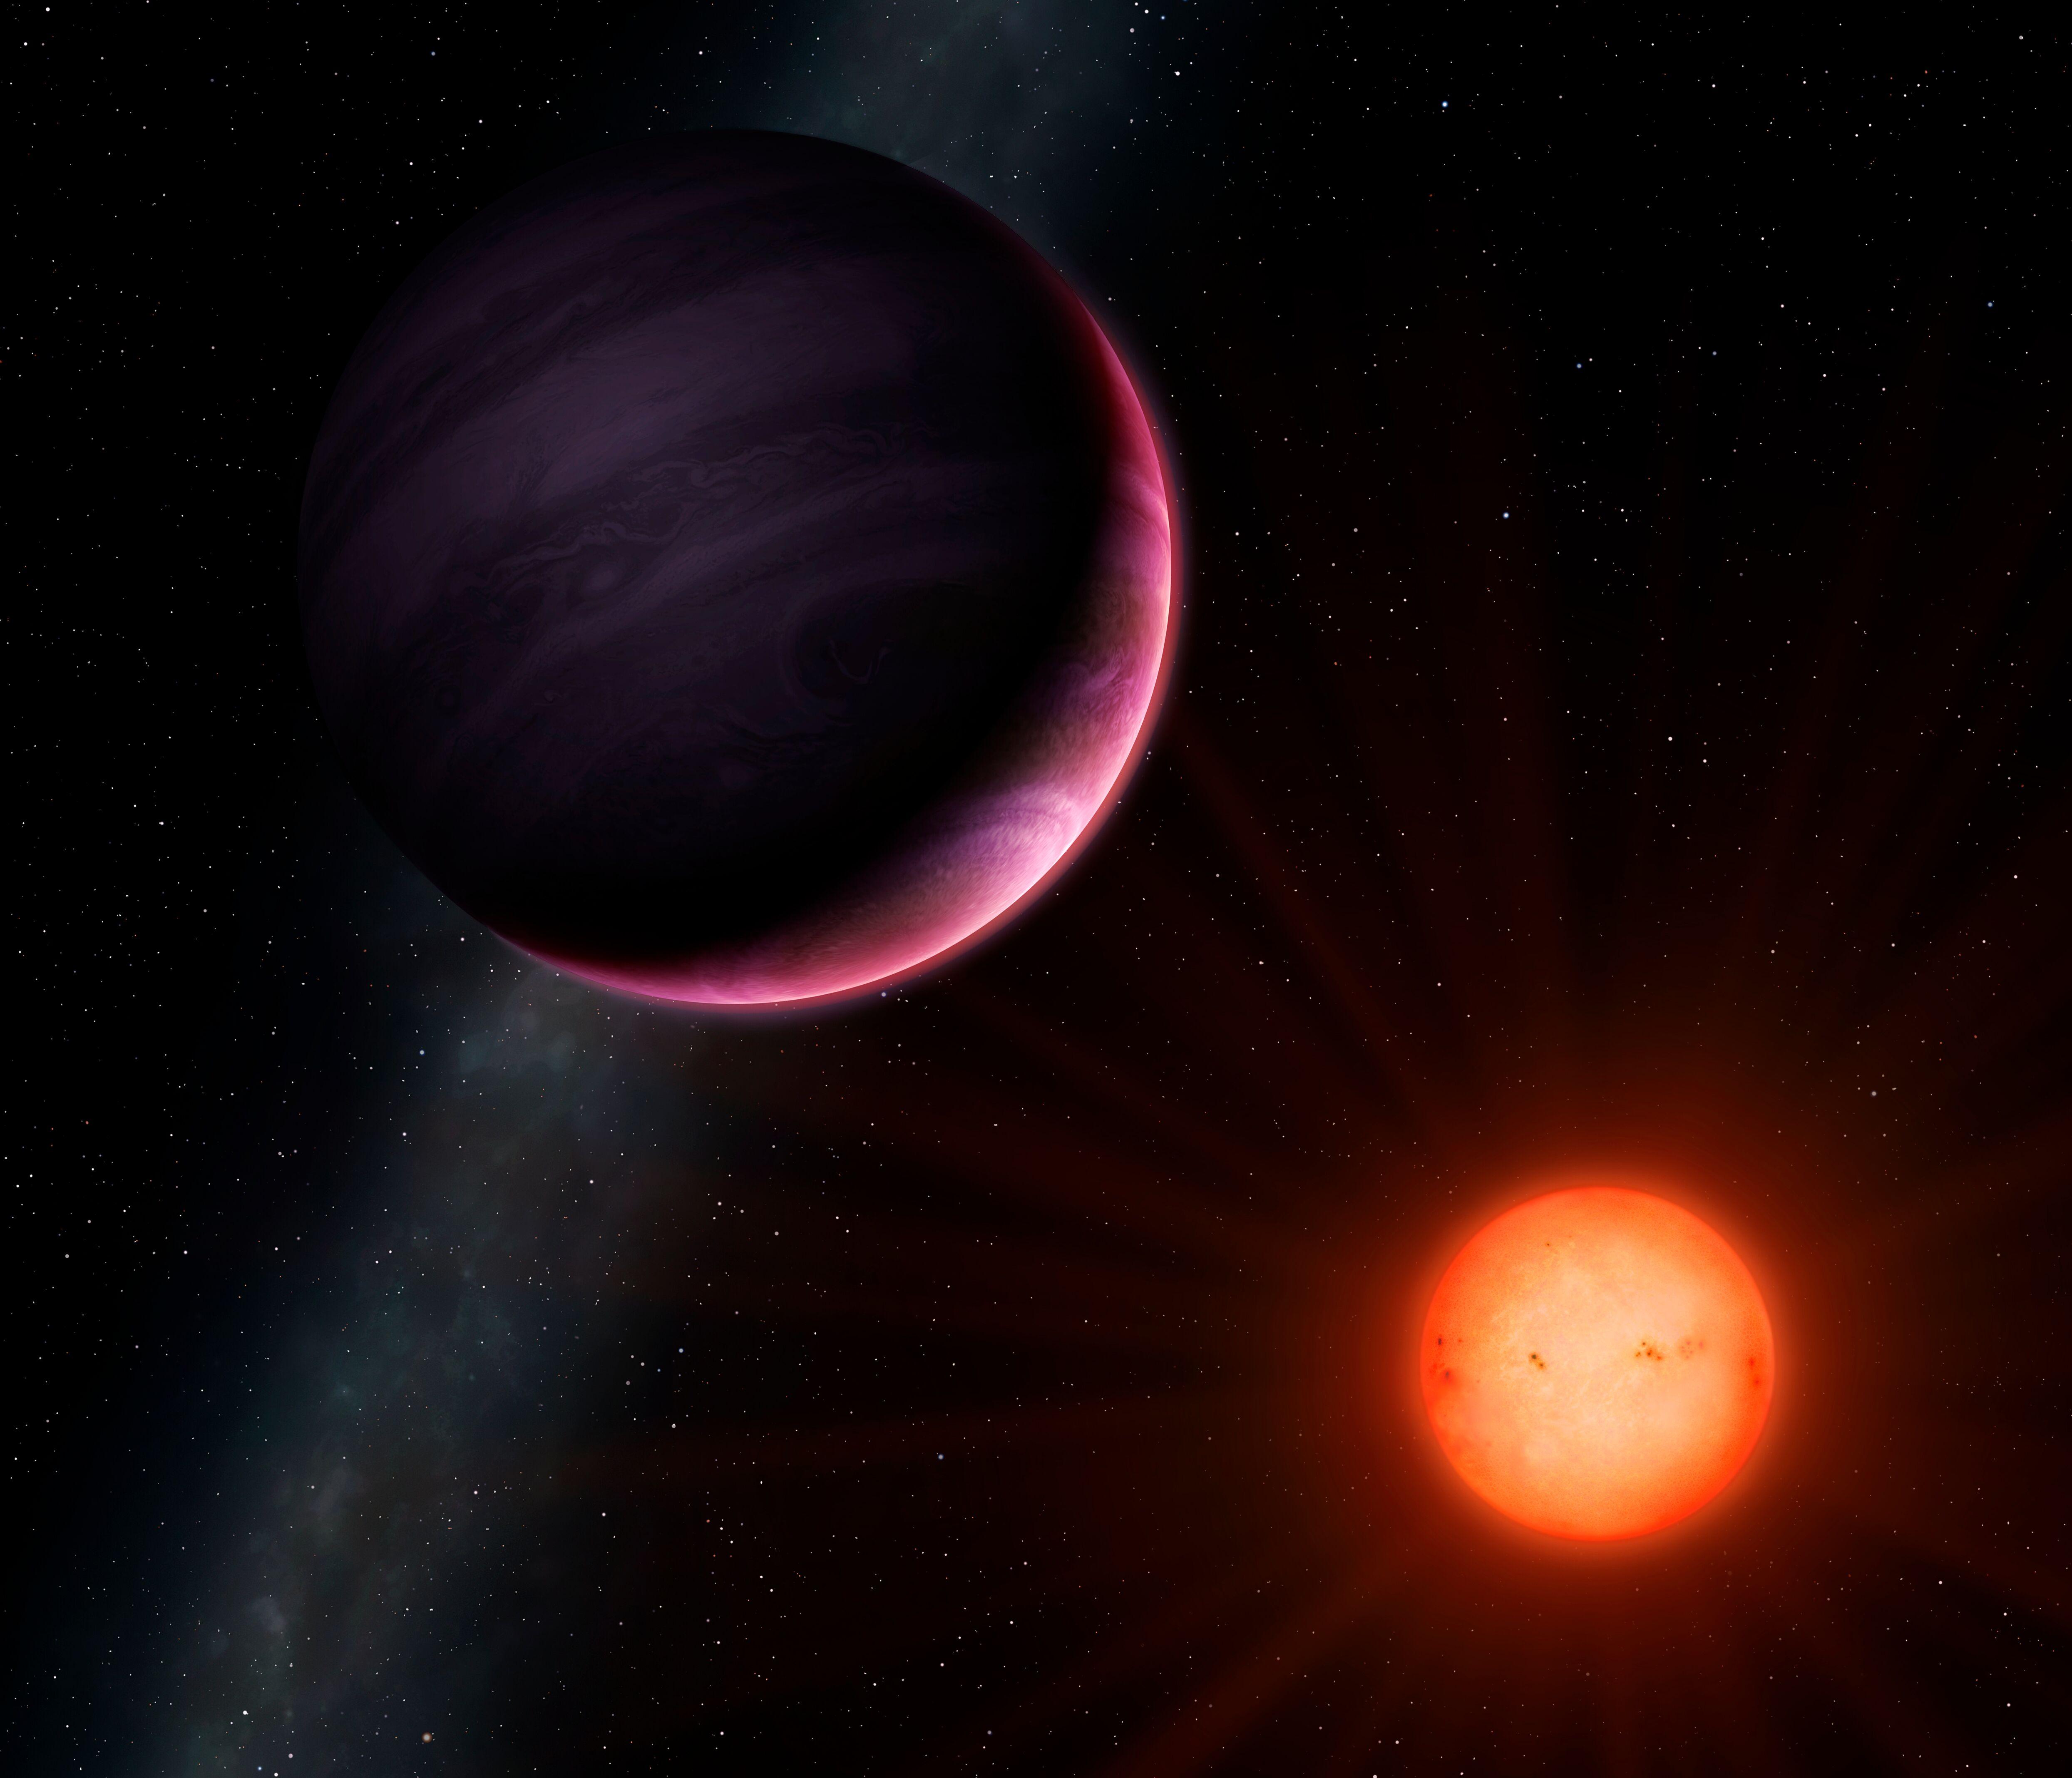 https://warwick.ac.uk/services/communications/medialibrary/images/october2017/exoplanet_ngts-1b_-_version_1_-_credit_university_of_warwick__mark_garlick.jpg